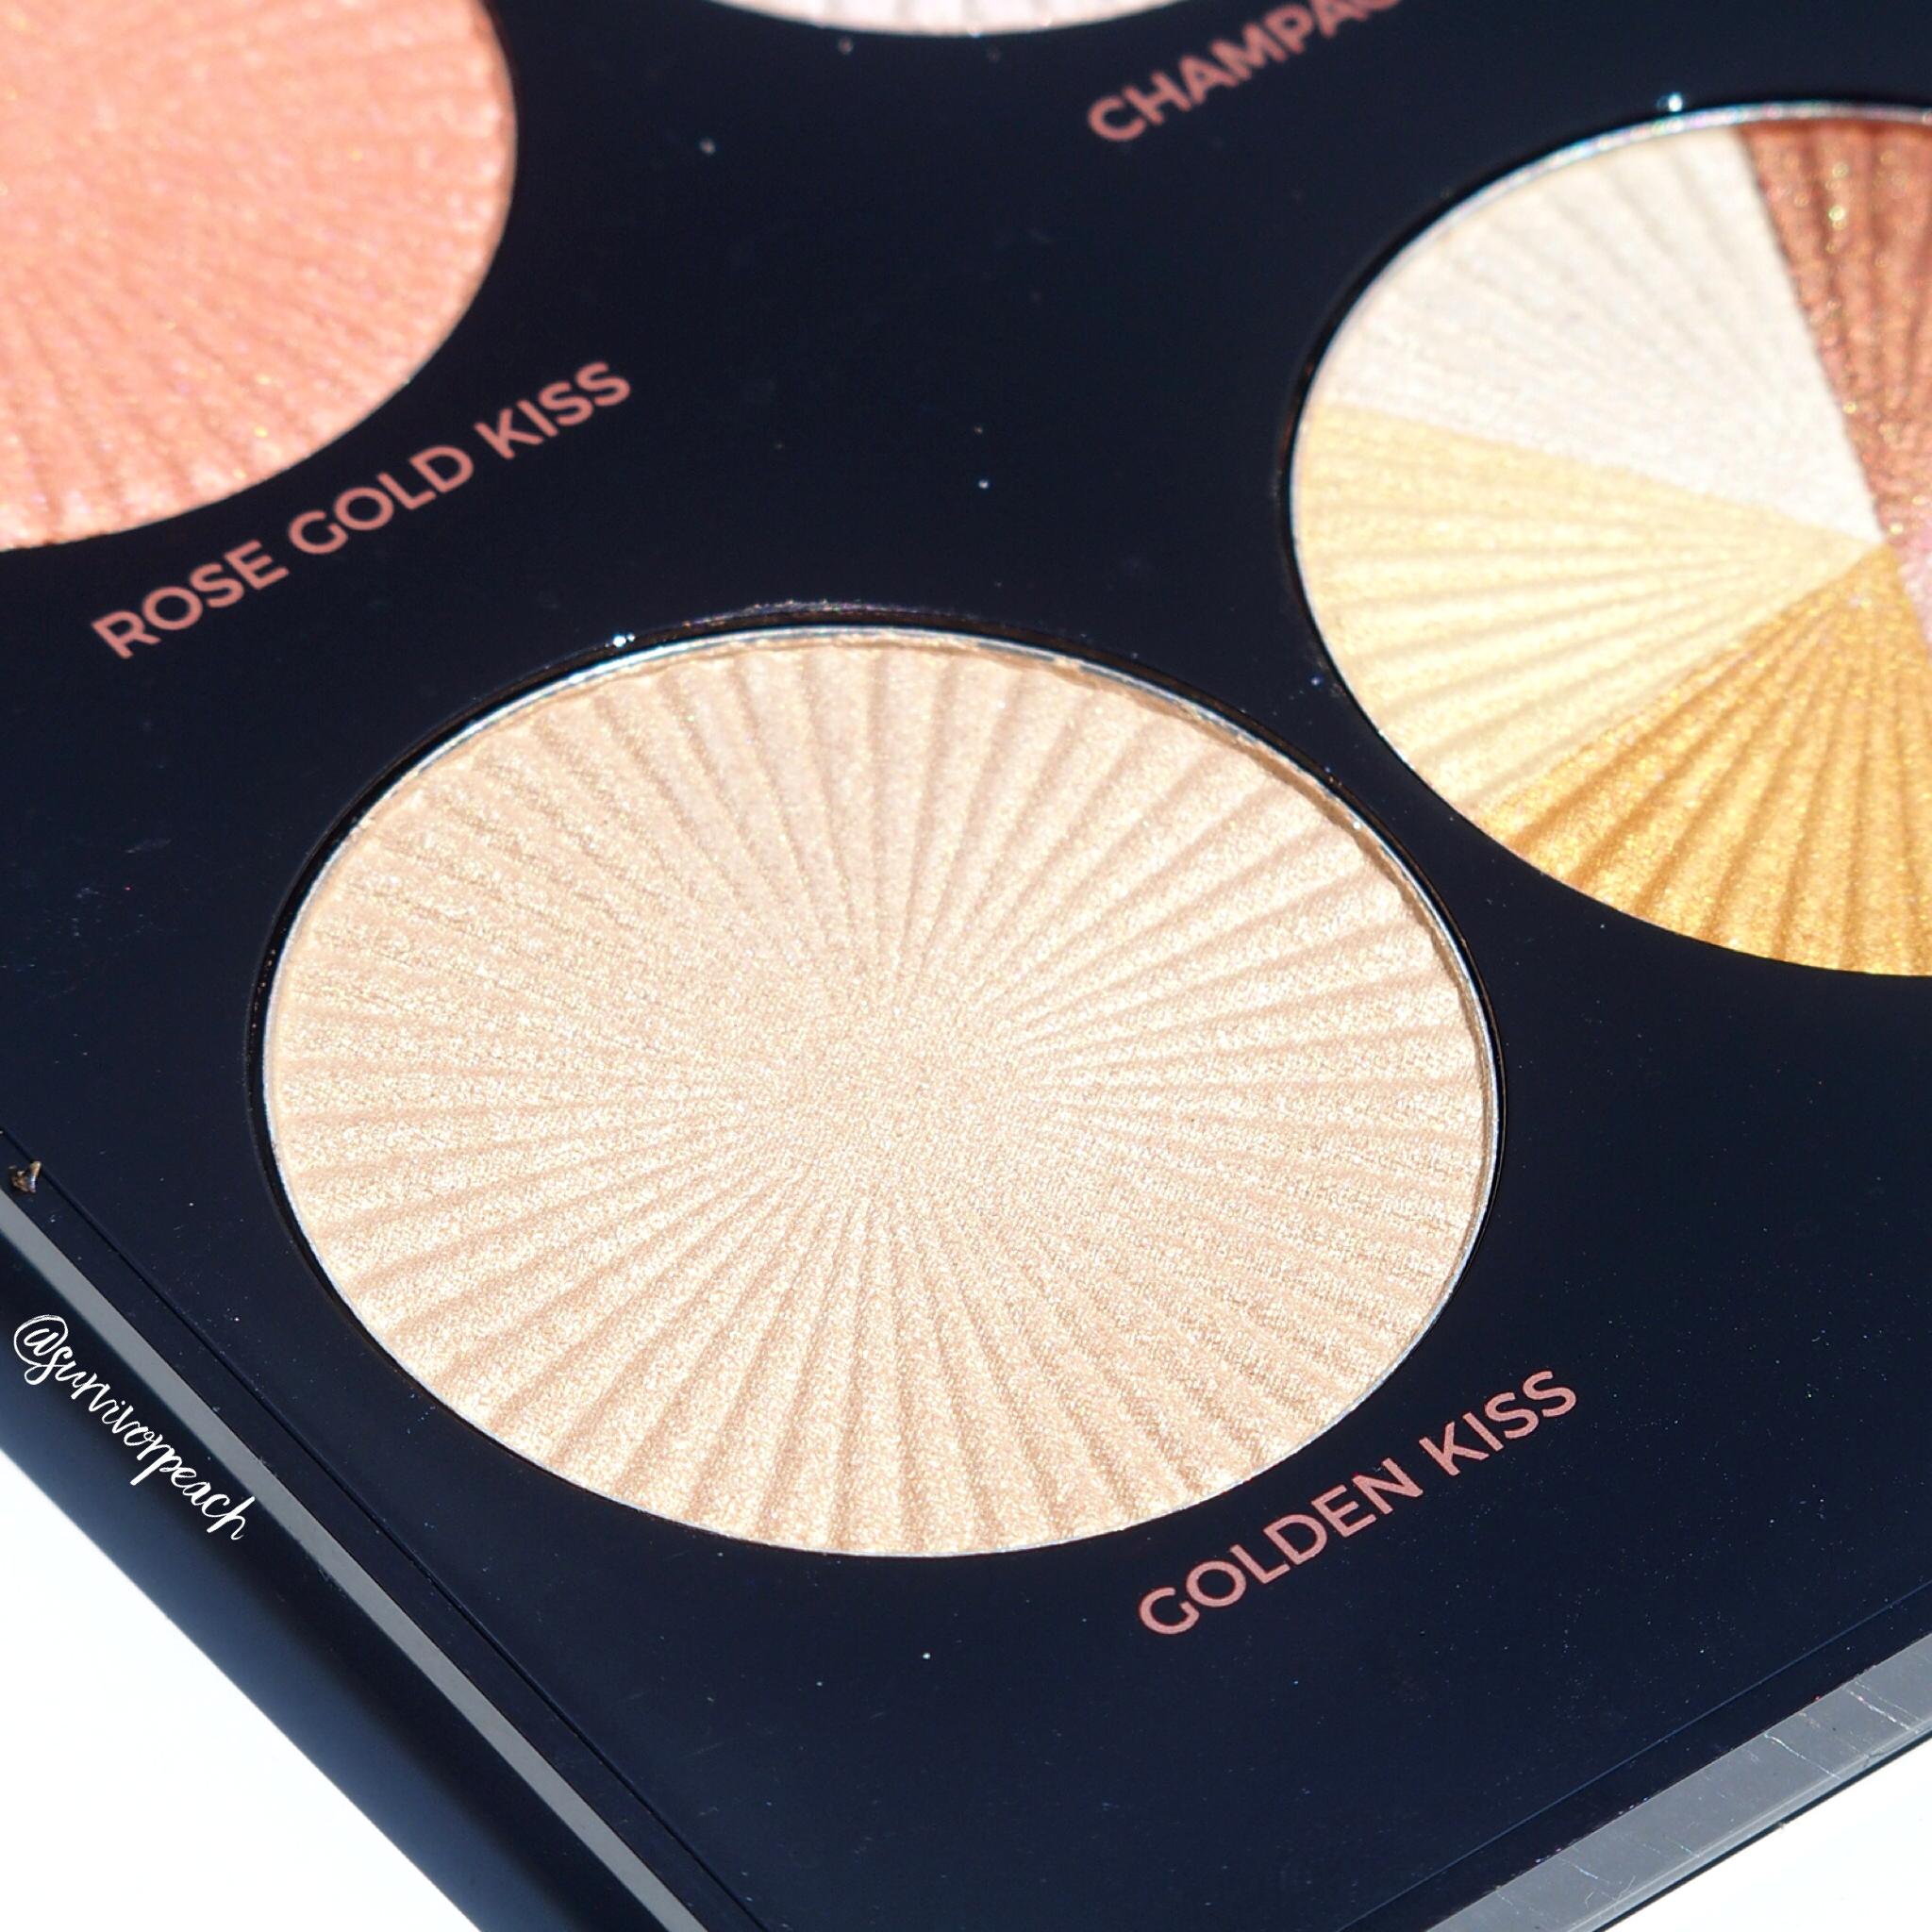 Makeup Revolution Pro HD Glow Getter palette shade Golden Kiss